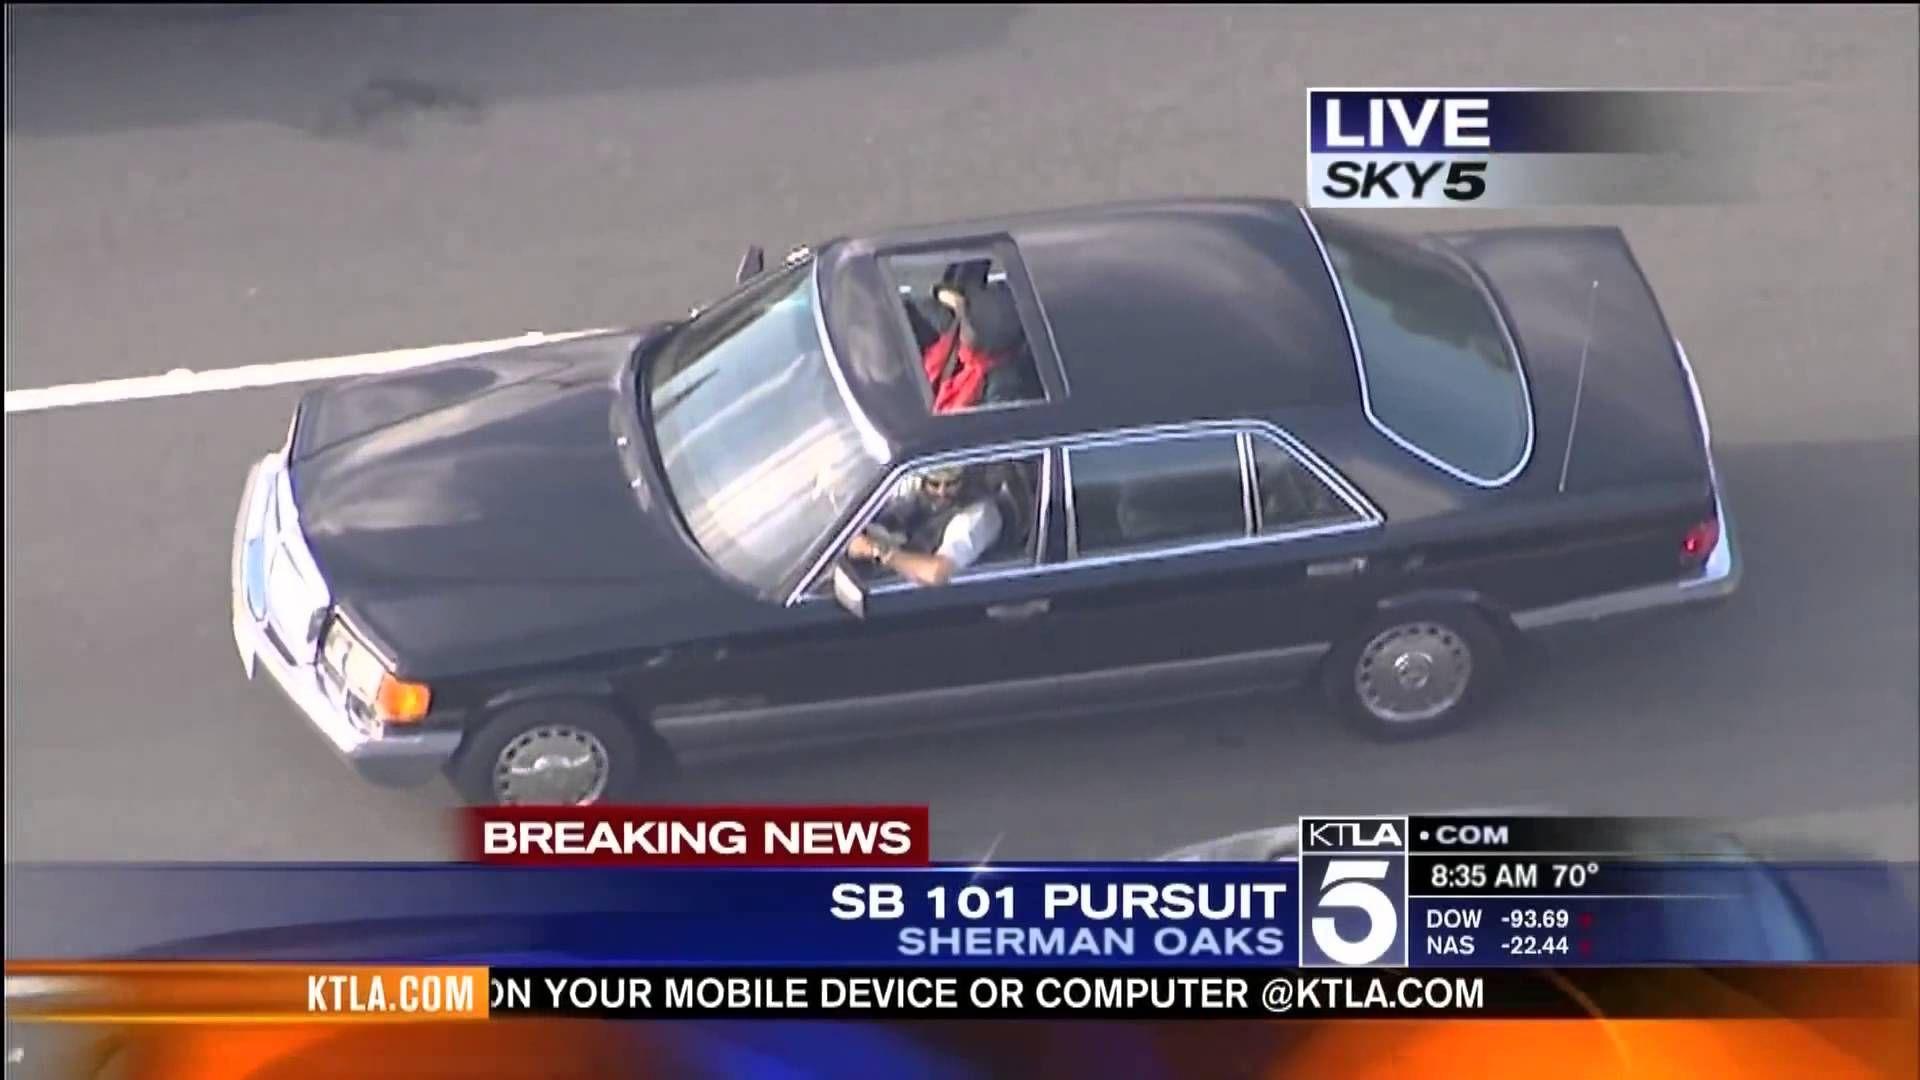 Southern California High Speed Police Pursuit Mercedes Benz Over 120 Mph Ktla Mercedes Benz Benz Mercedes